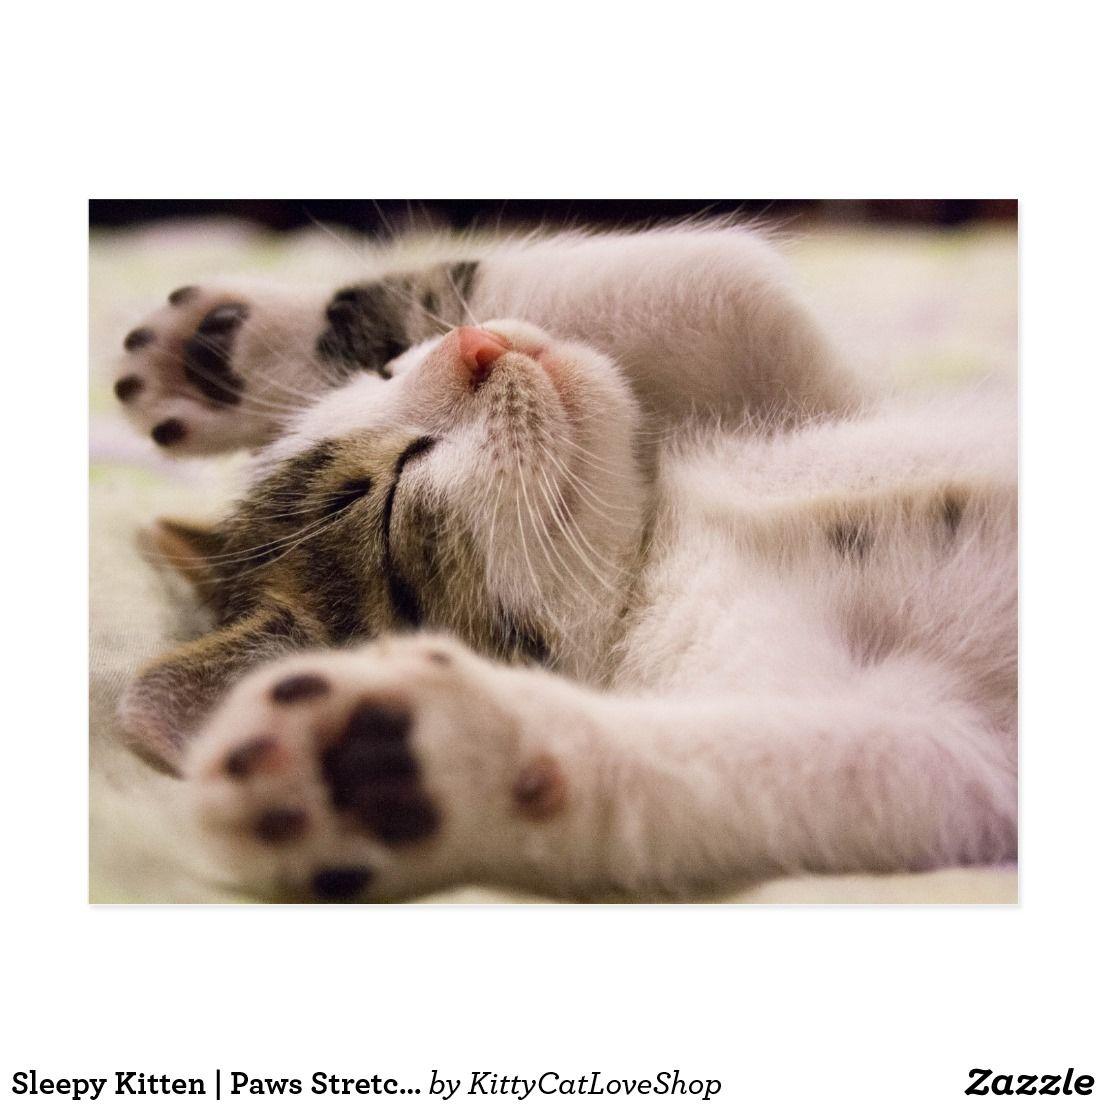 Sleepy Kitten Paws Stretched Out Postcard Zazzle Com Sleepy Kitten Cat Lovers Cat Love